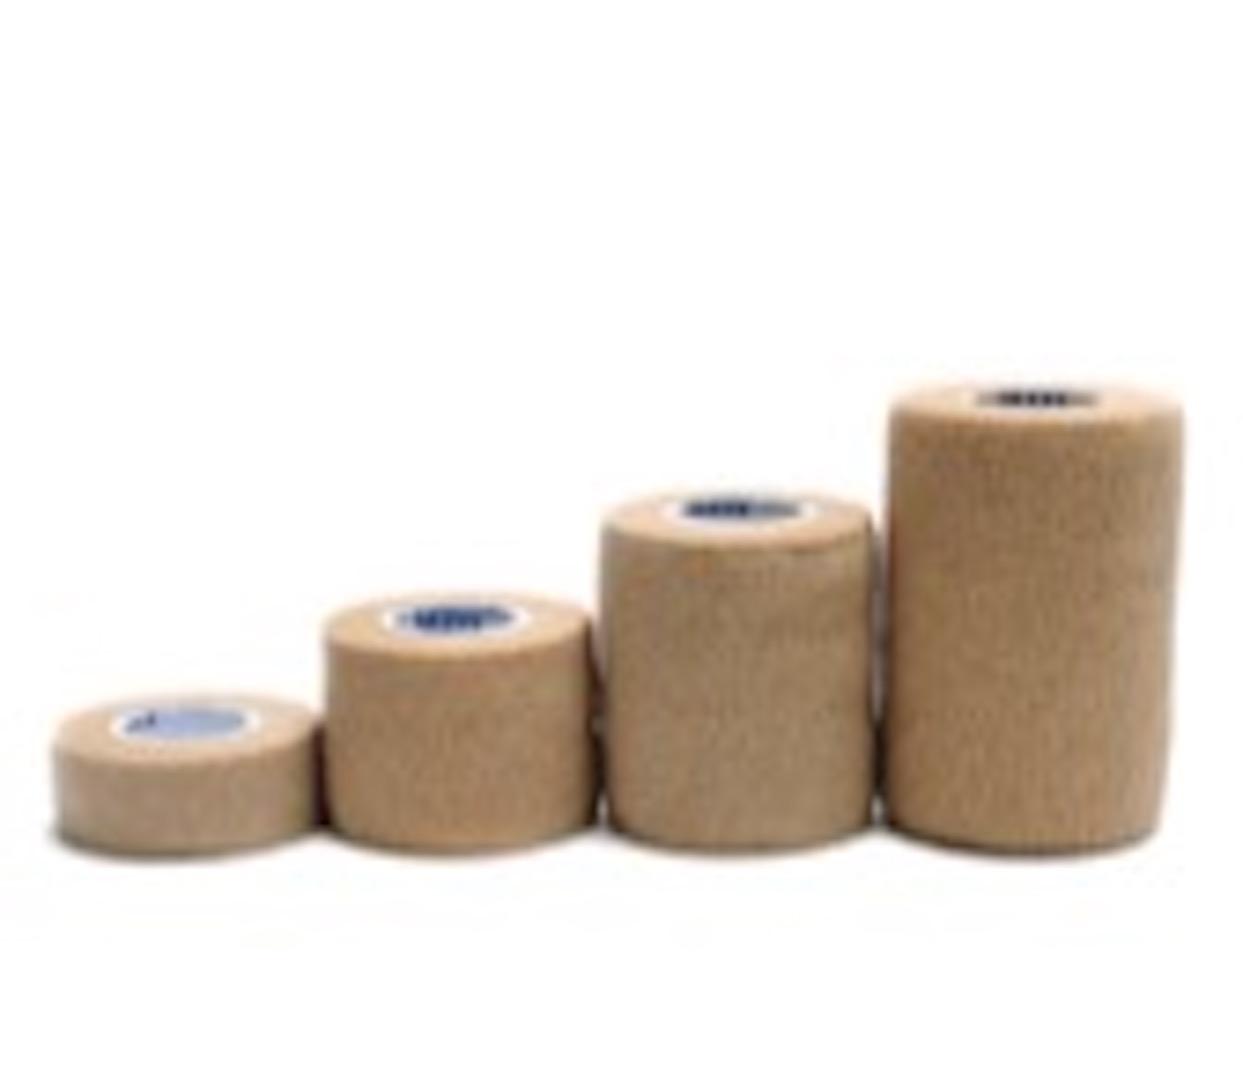 Cohesive Bandage, Non-woven, Spandex, Latex-free, Tan